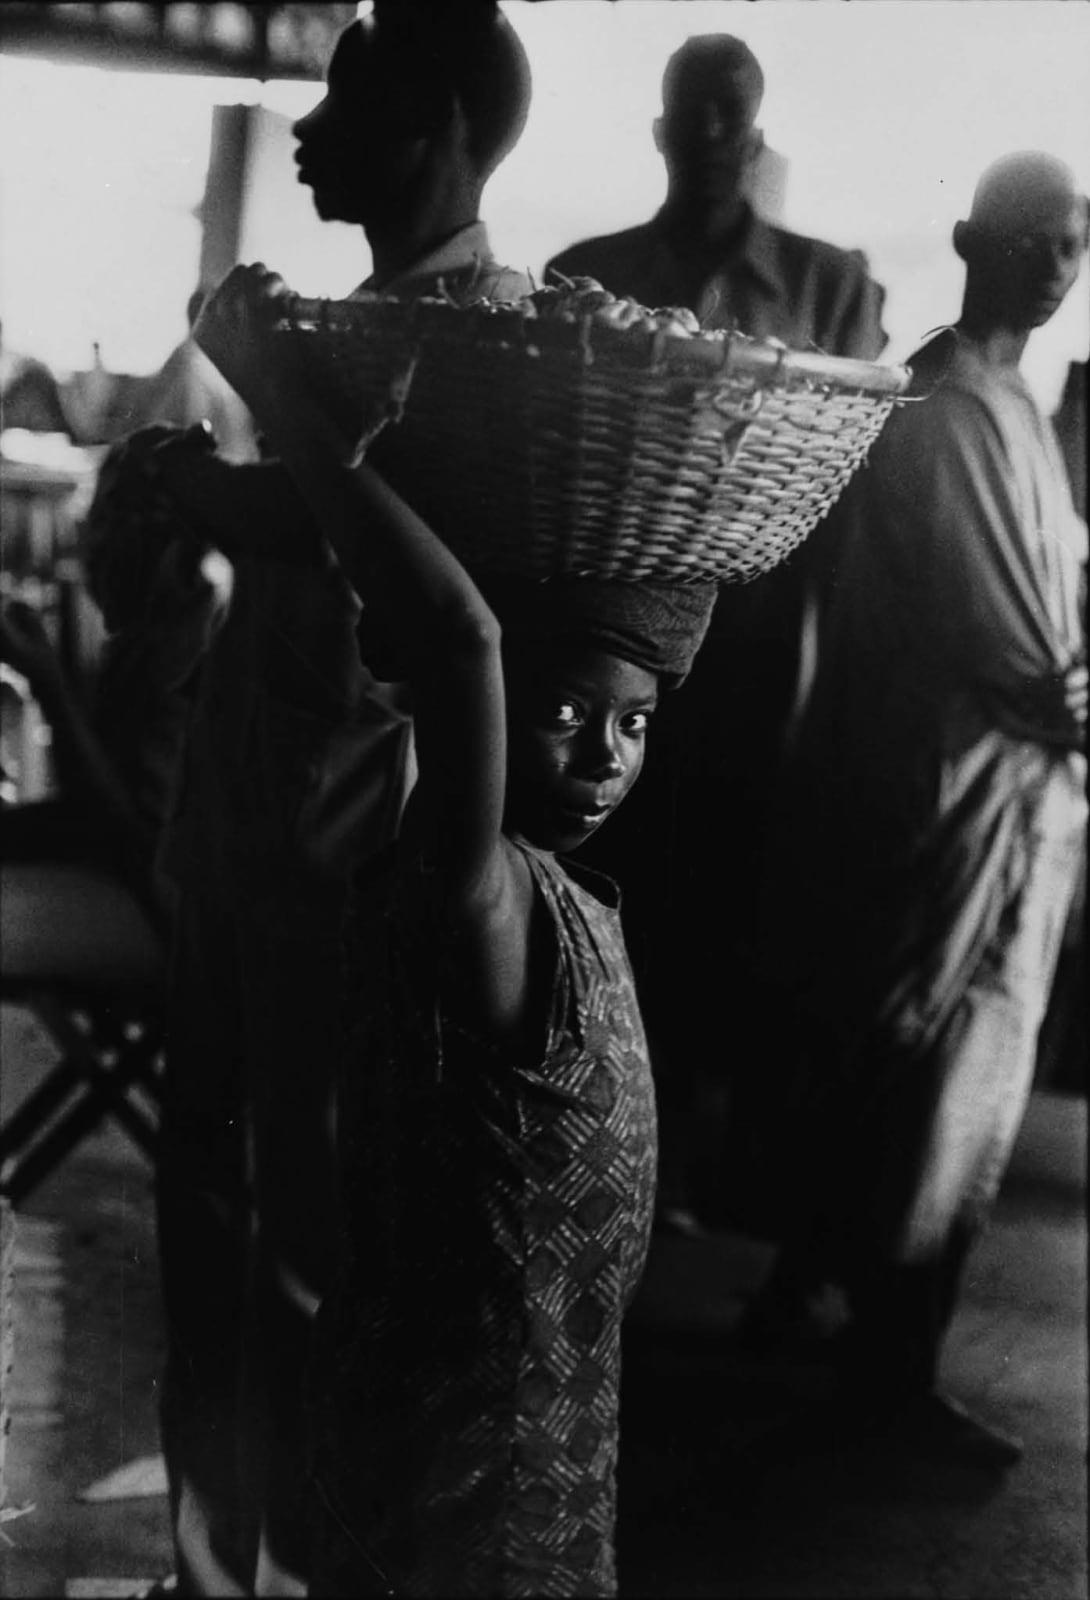 Ming Smith, Child Porter, Abidjan, Ivory Coast, 1972